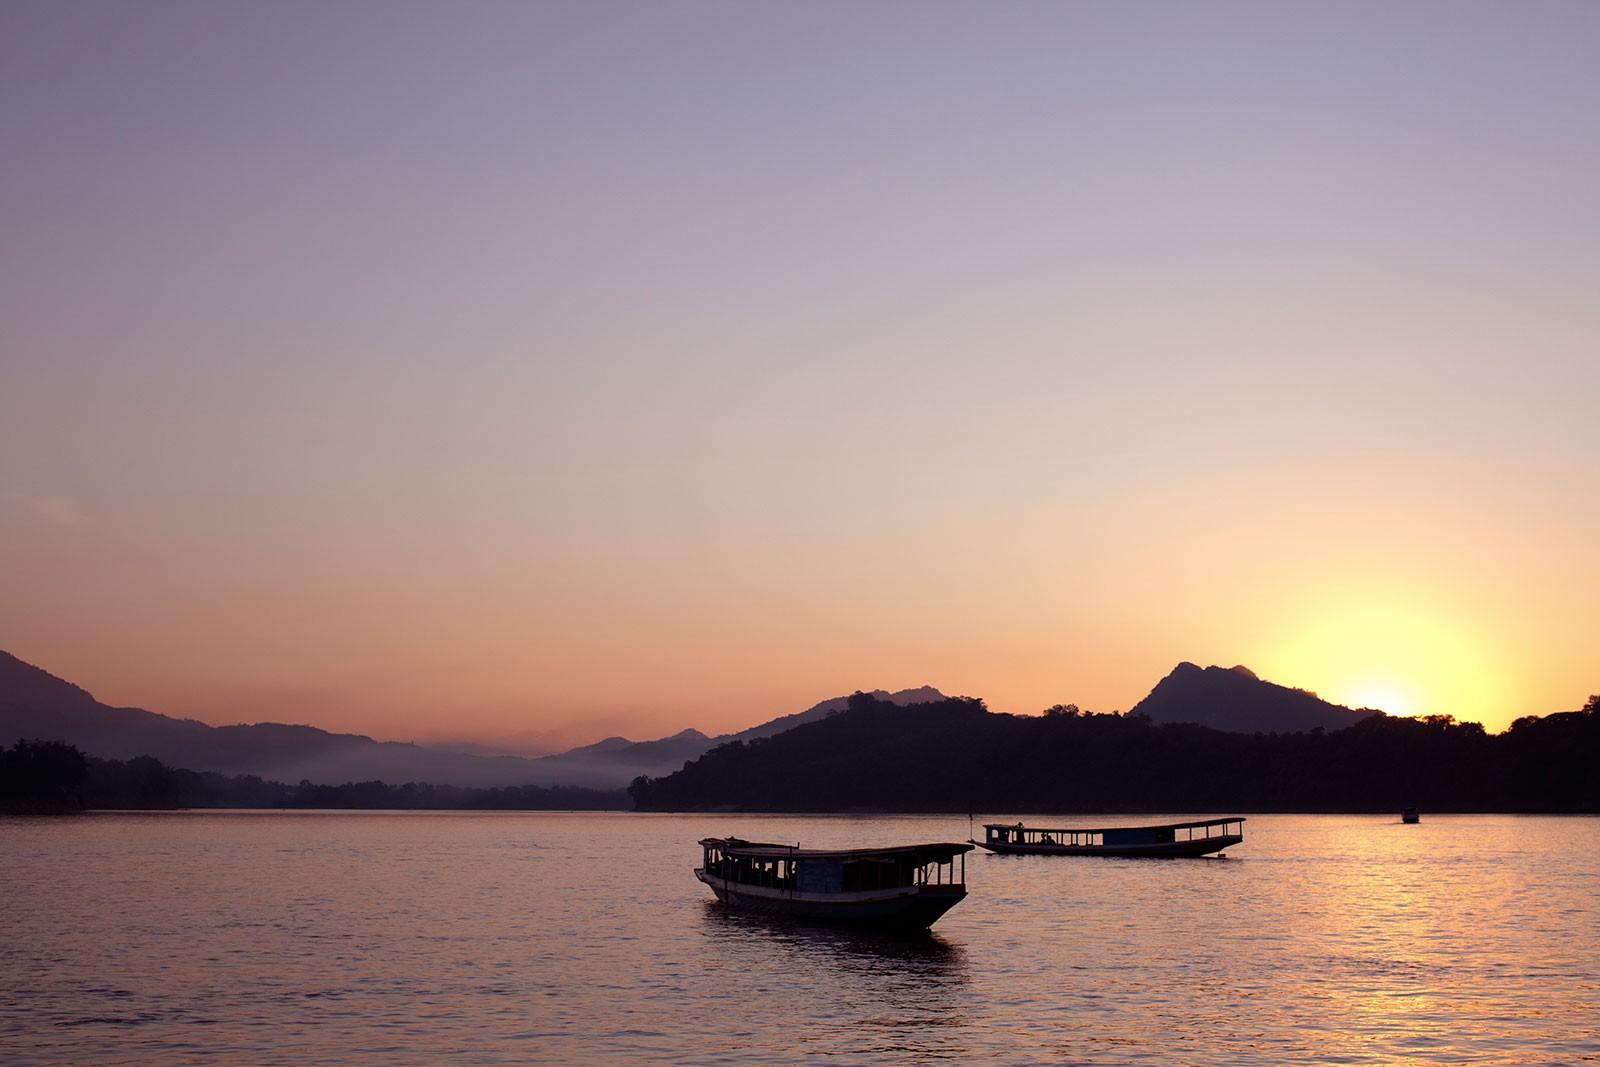 09-Taka-River-Boat_Dusk.jpg